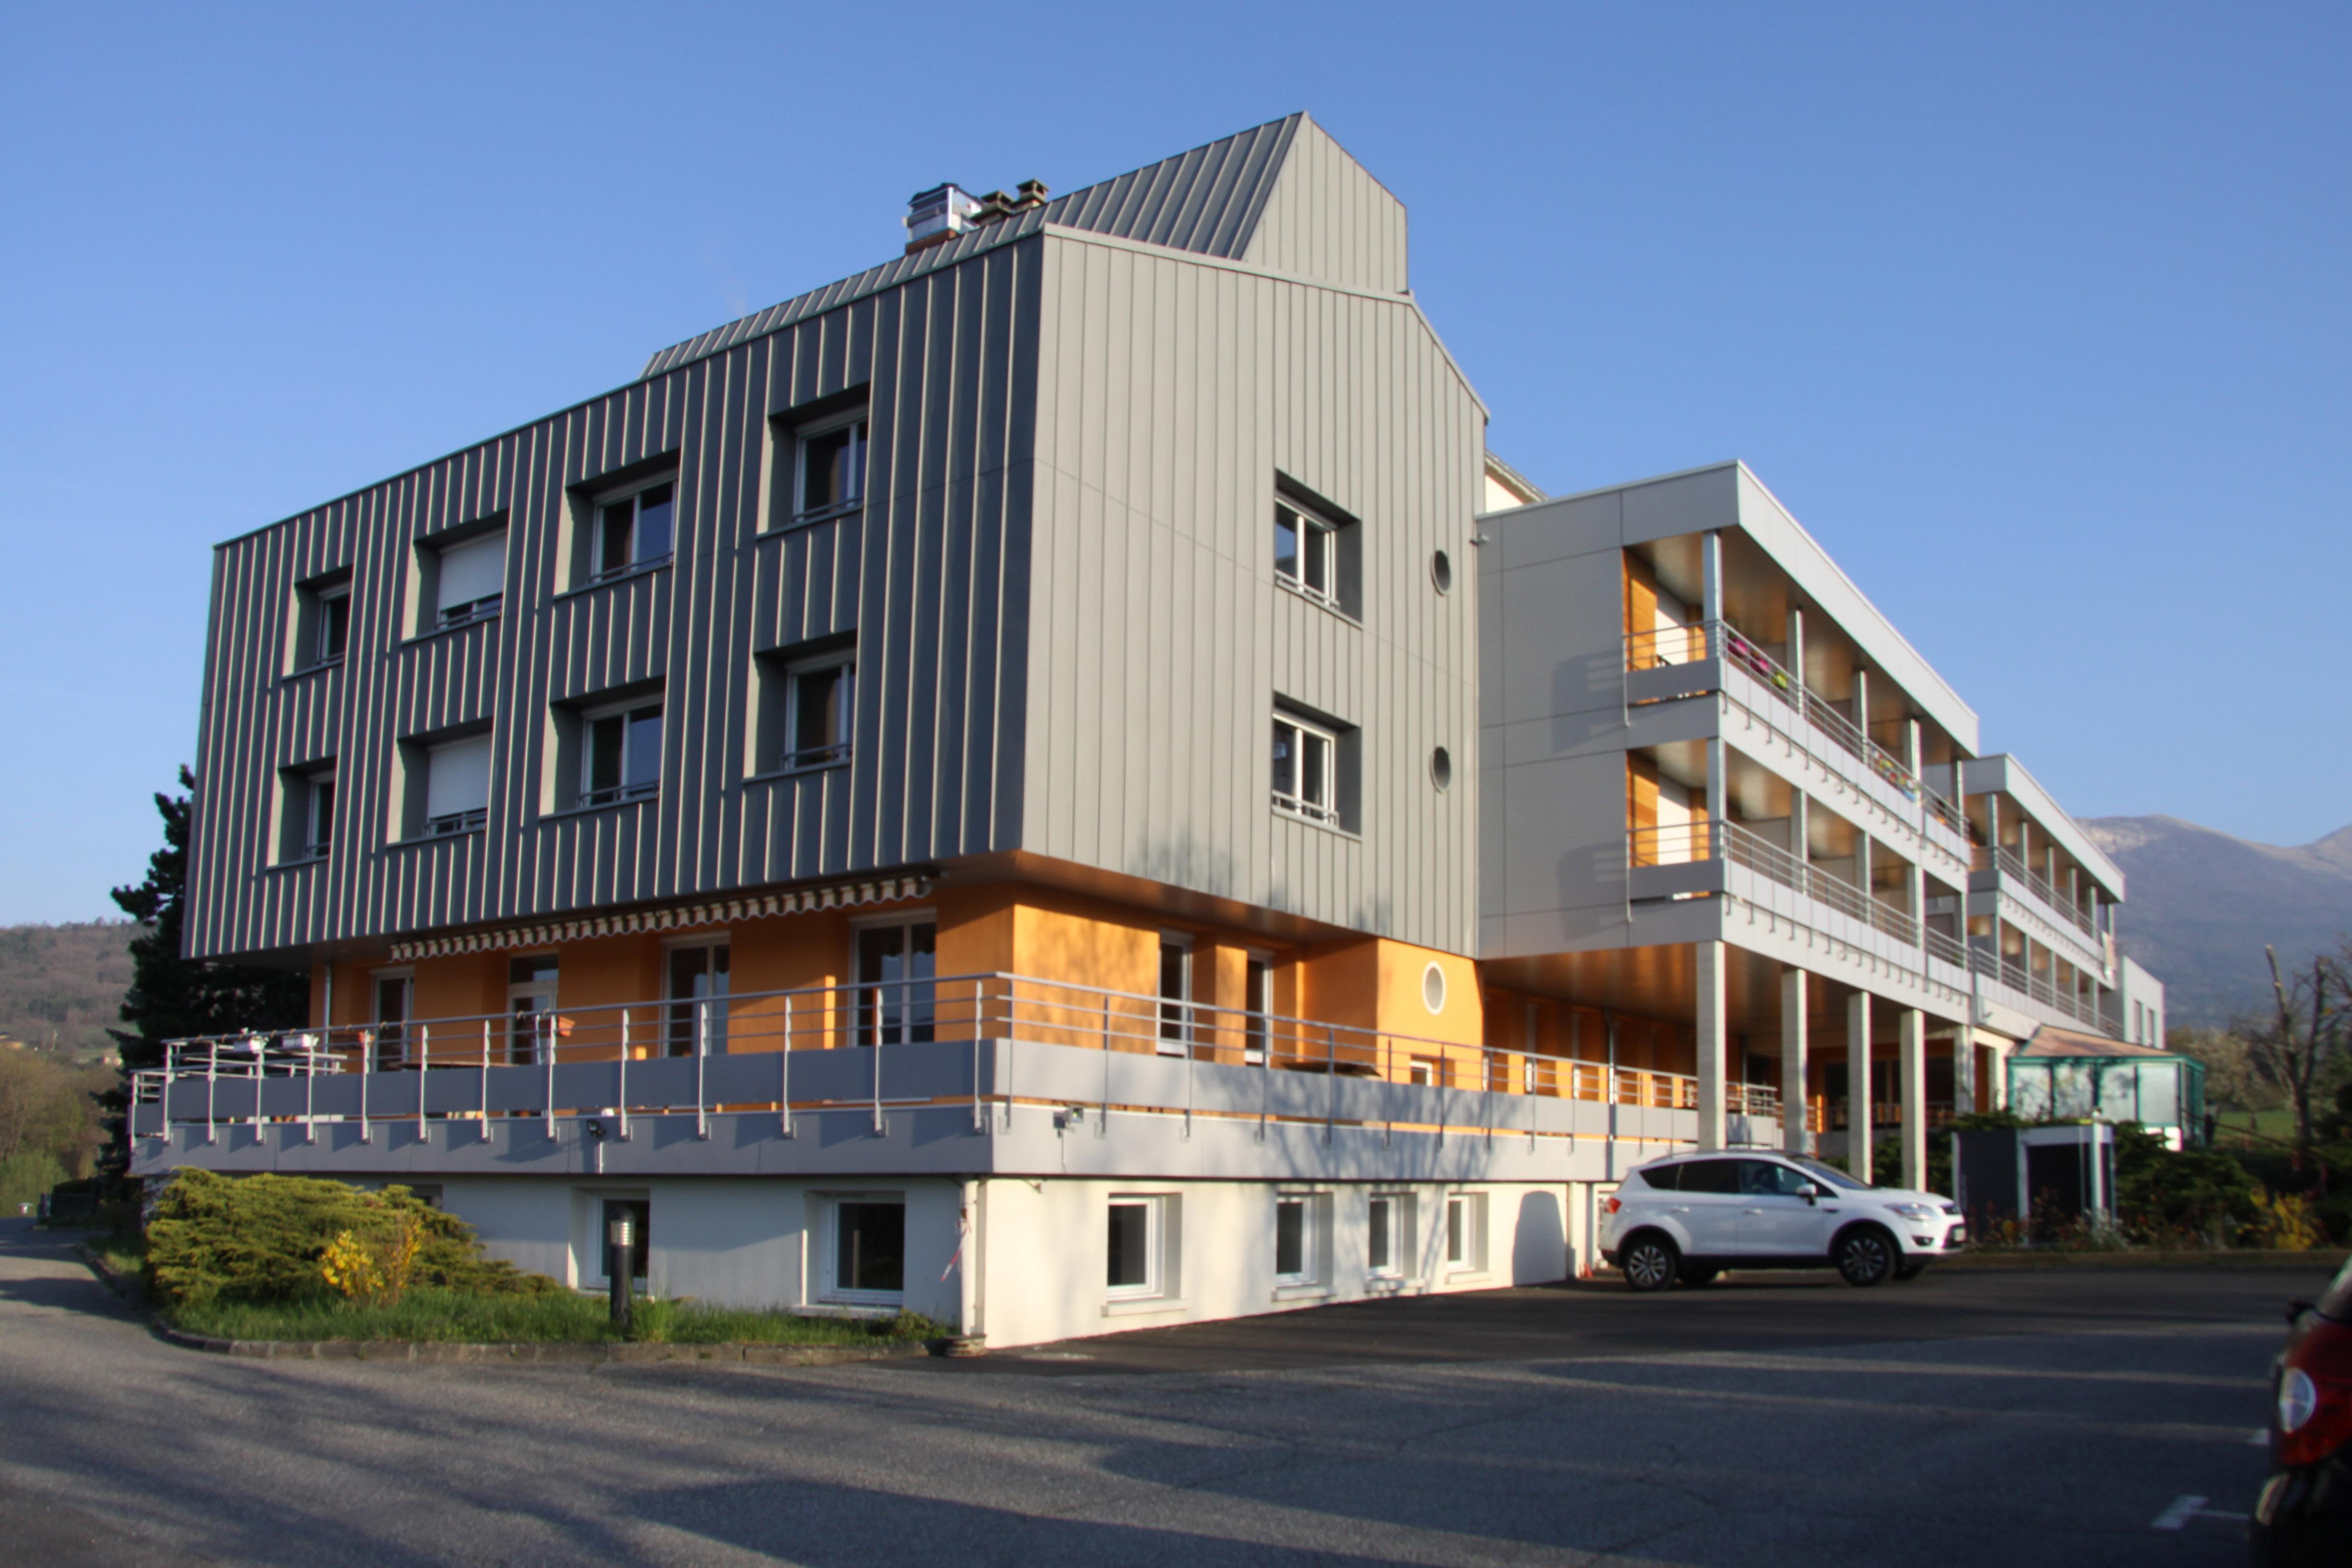 atelier d 39 architecture dufayard logement foyer albert borel apf gap 05. Black Bedroom Furniture Sets. Home Design Ideas